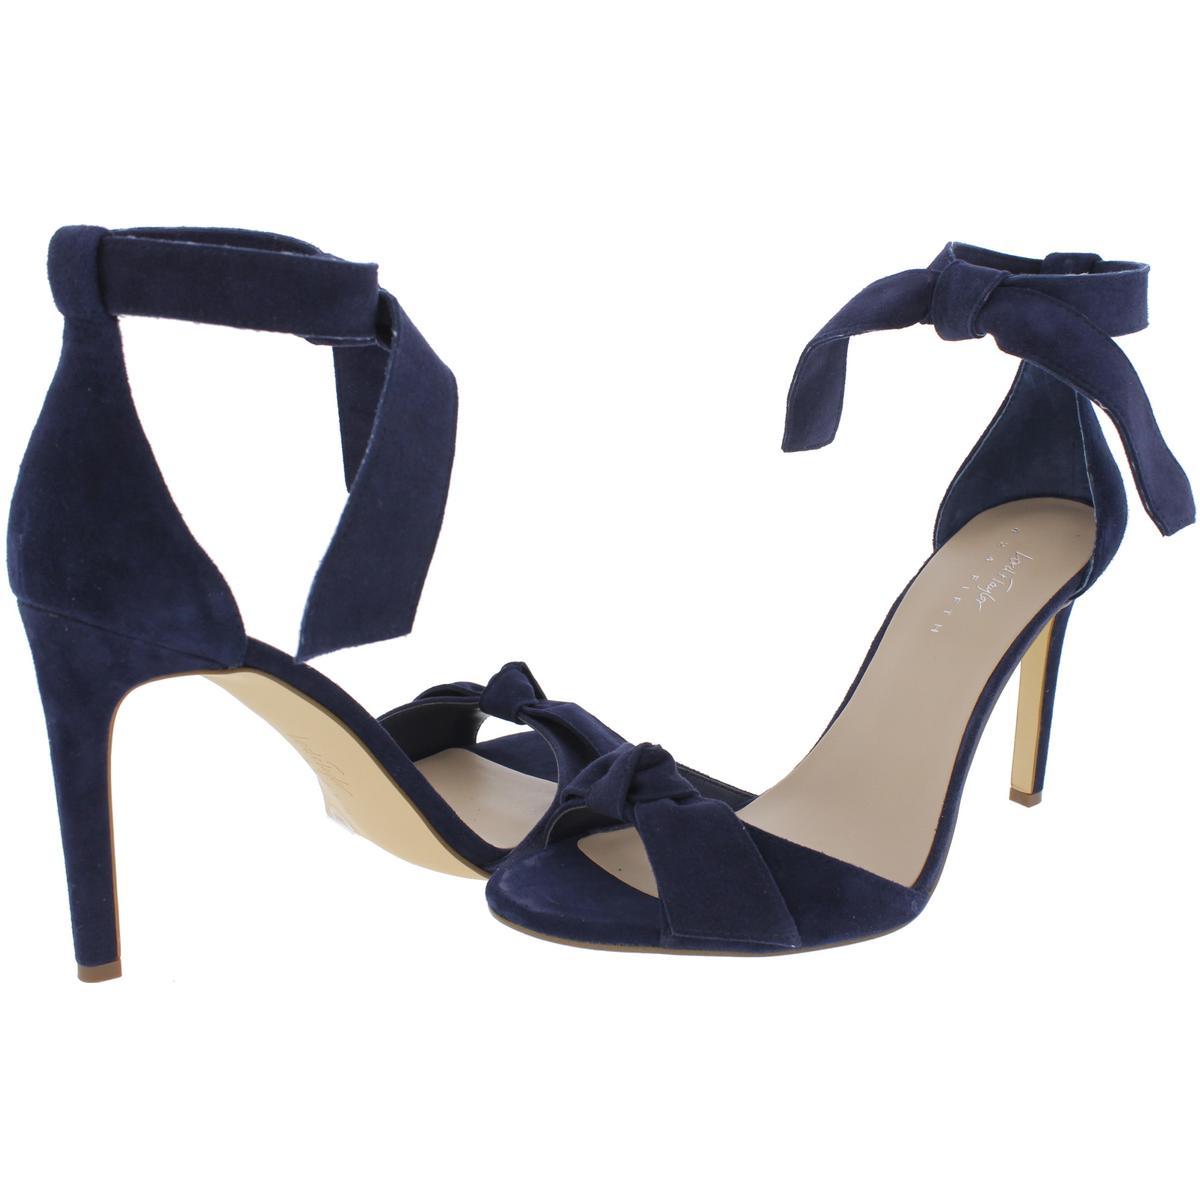 424 Fifth Womens Faye Suede Evening Stilettos Dress Sandals Heels BHFO 2995